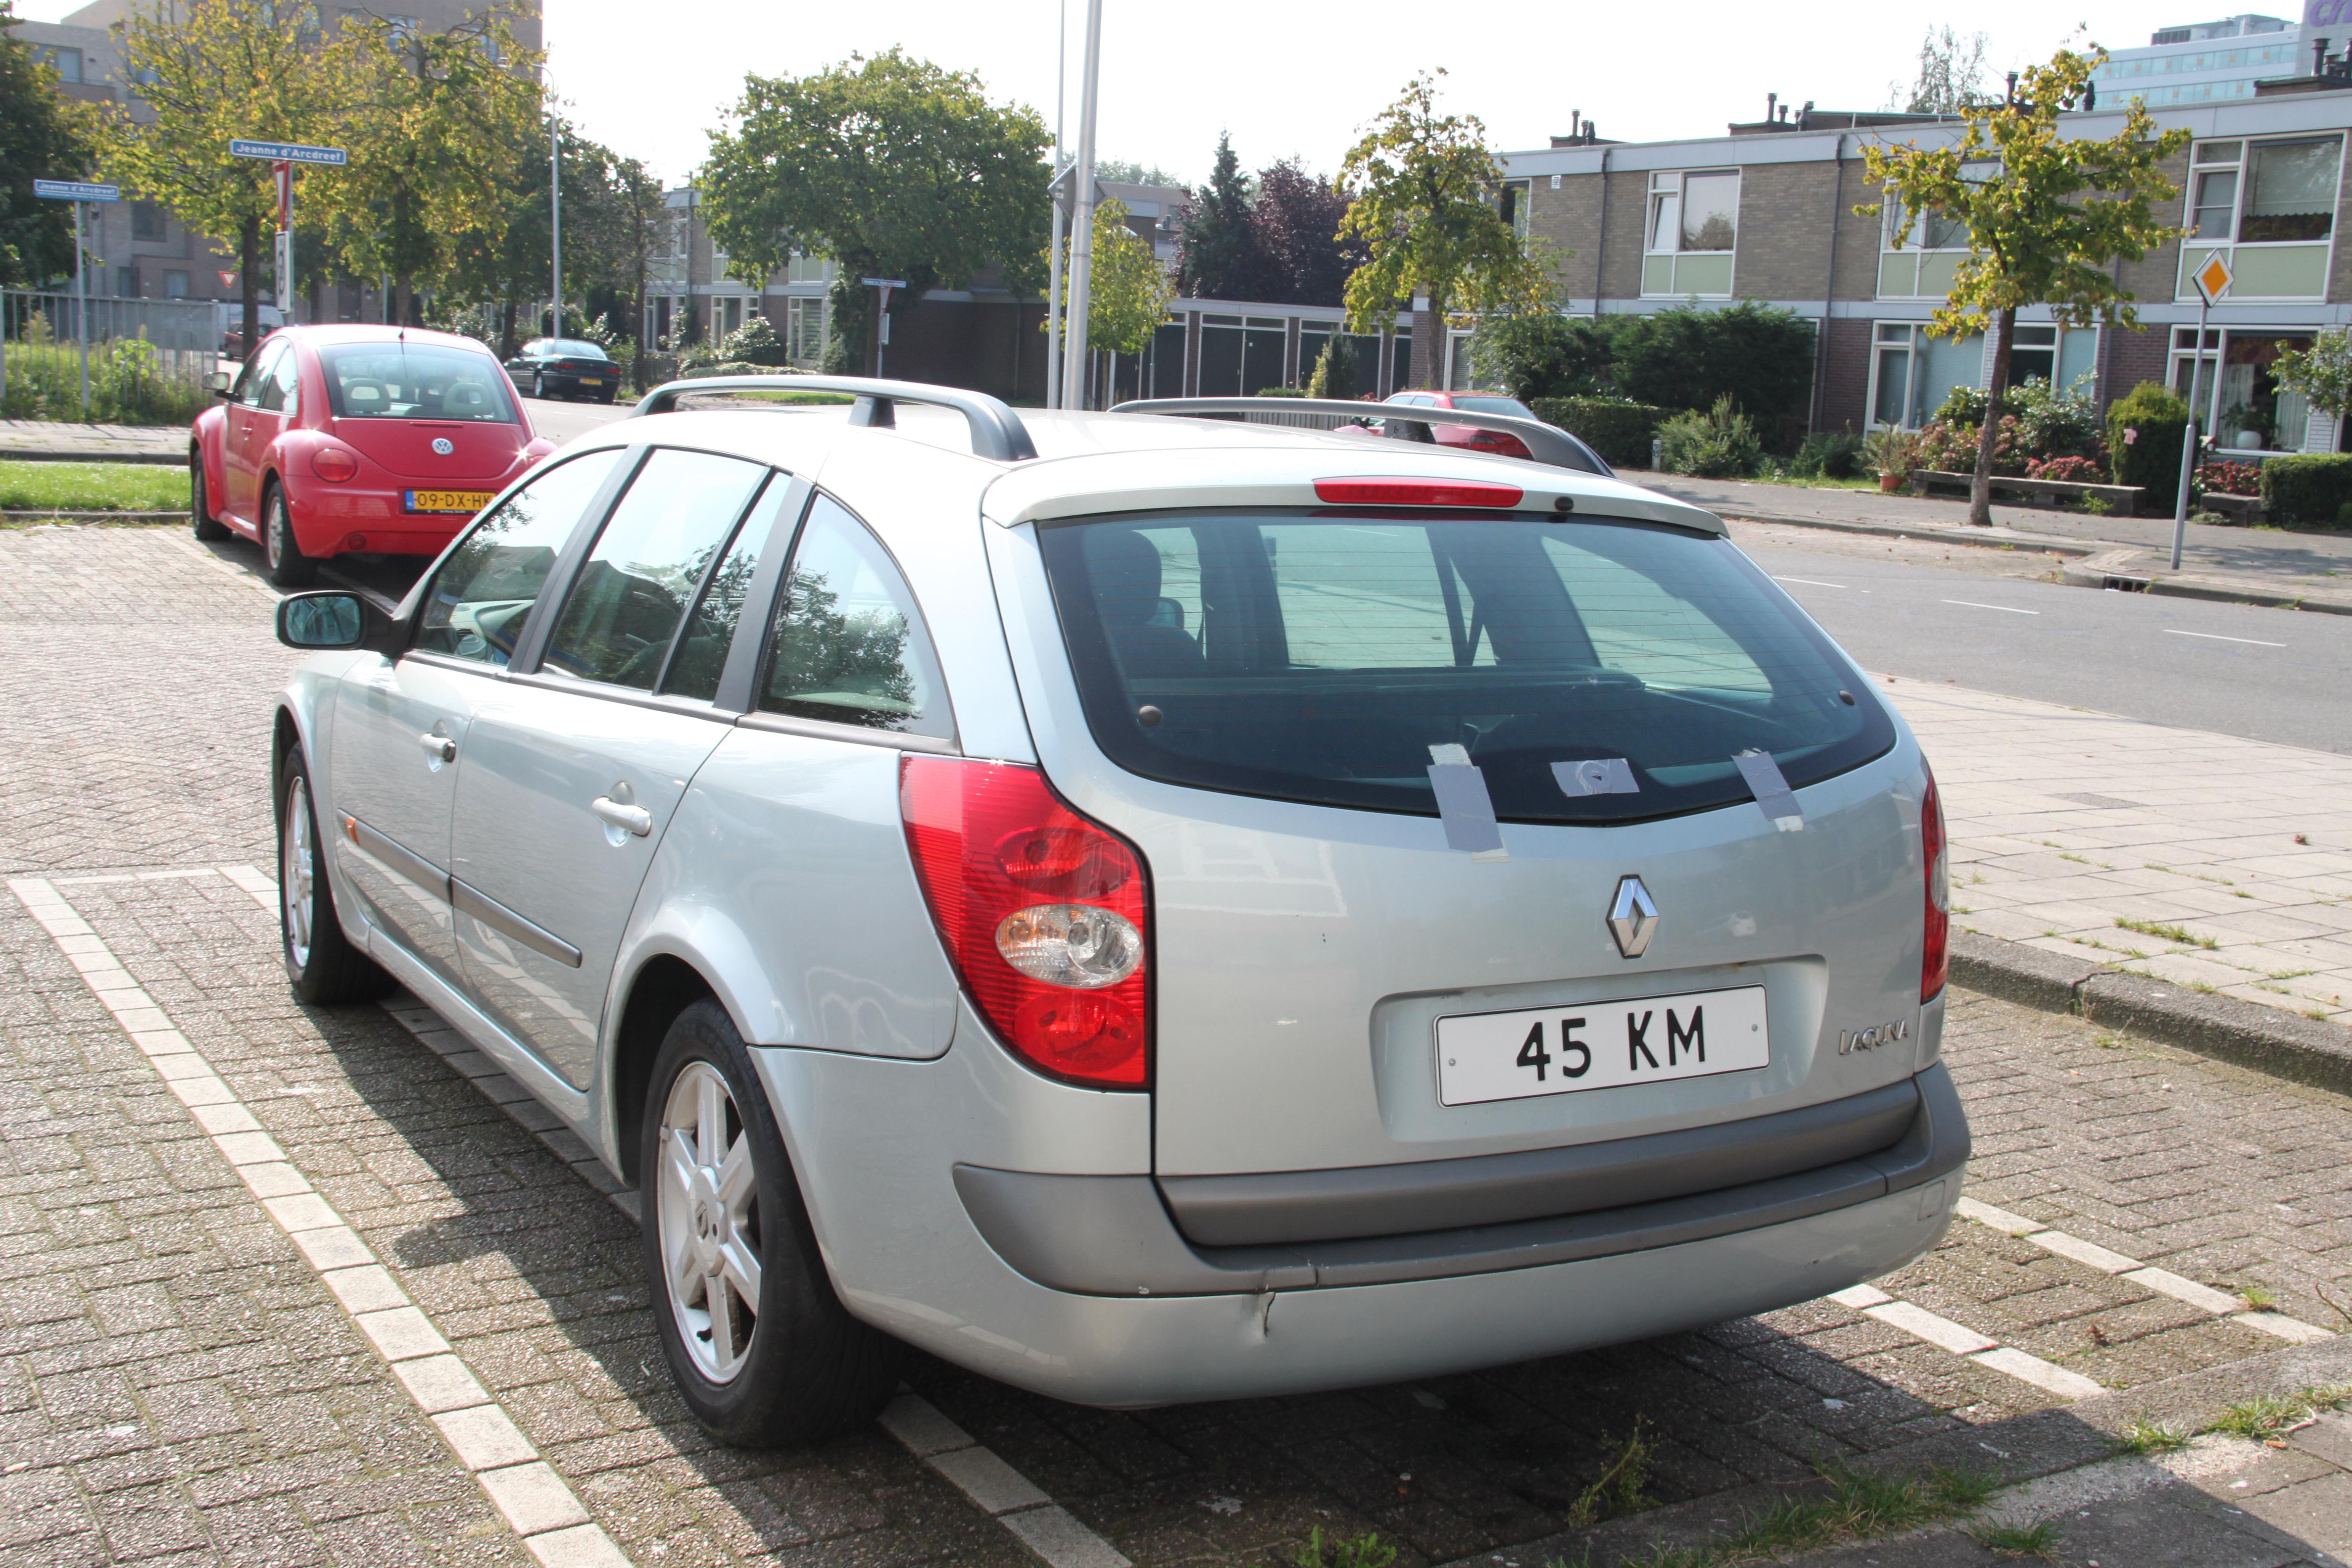 File:Renault Laguna 45km car Utrecht 2.JPG - Wikimedia Commons